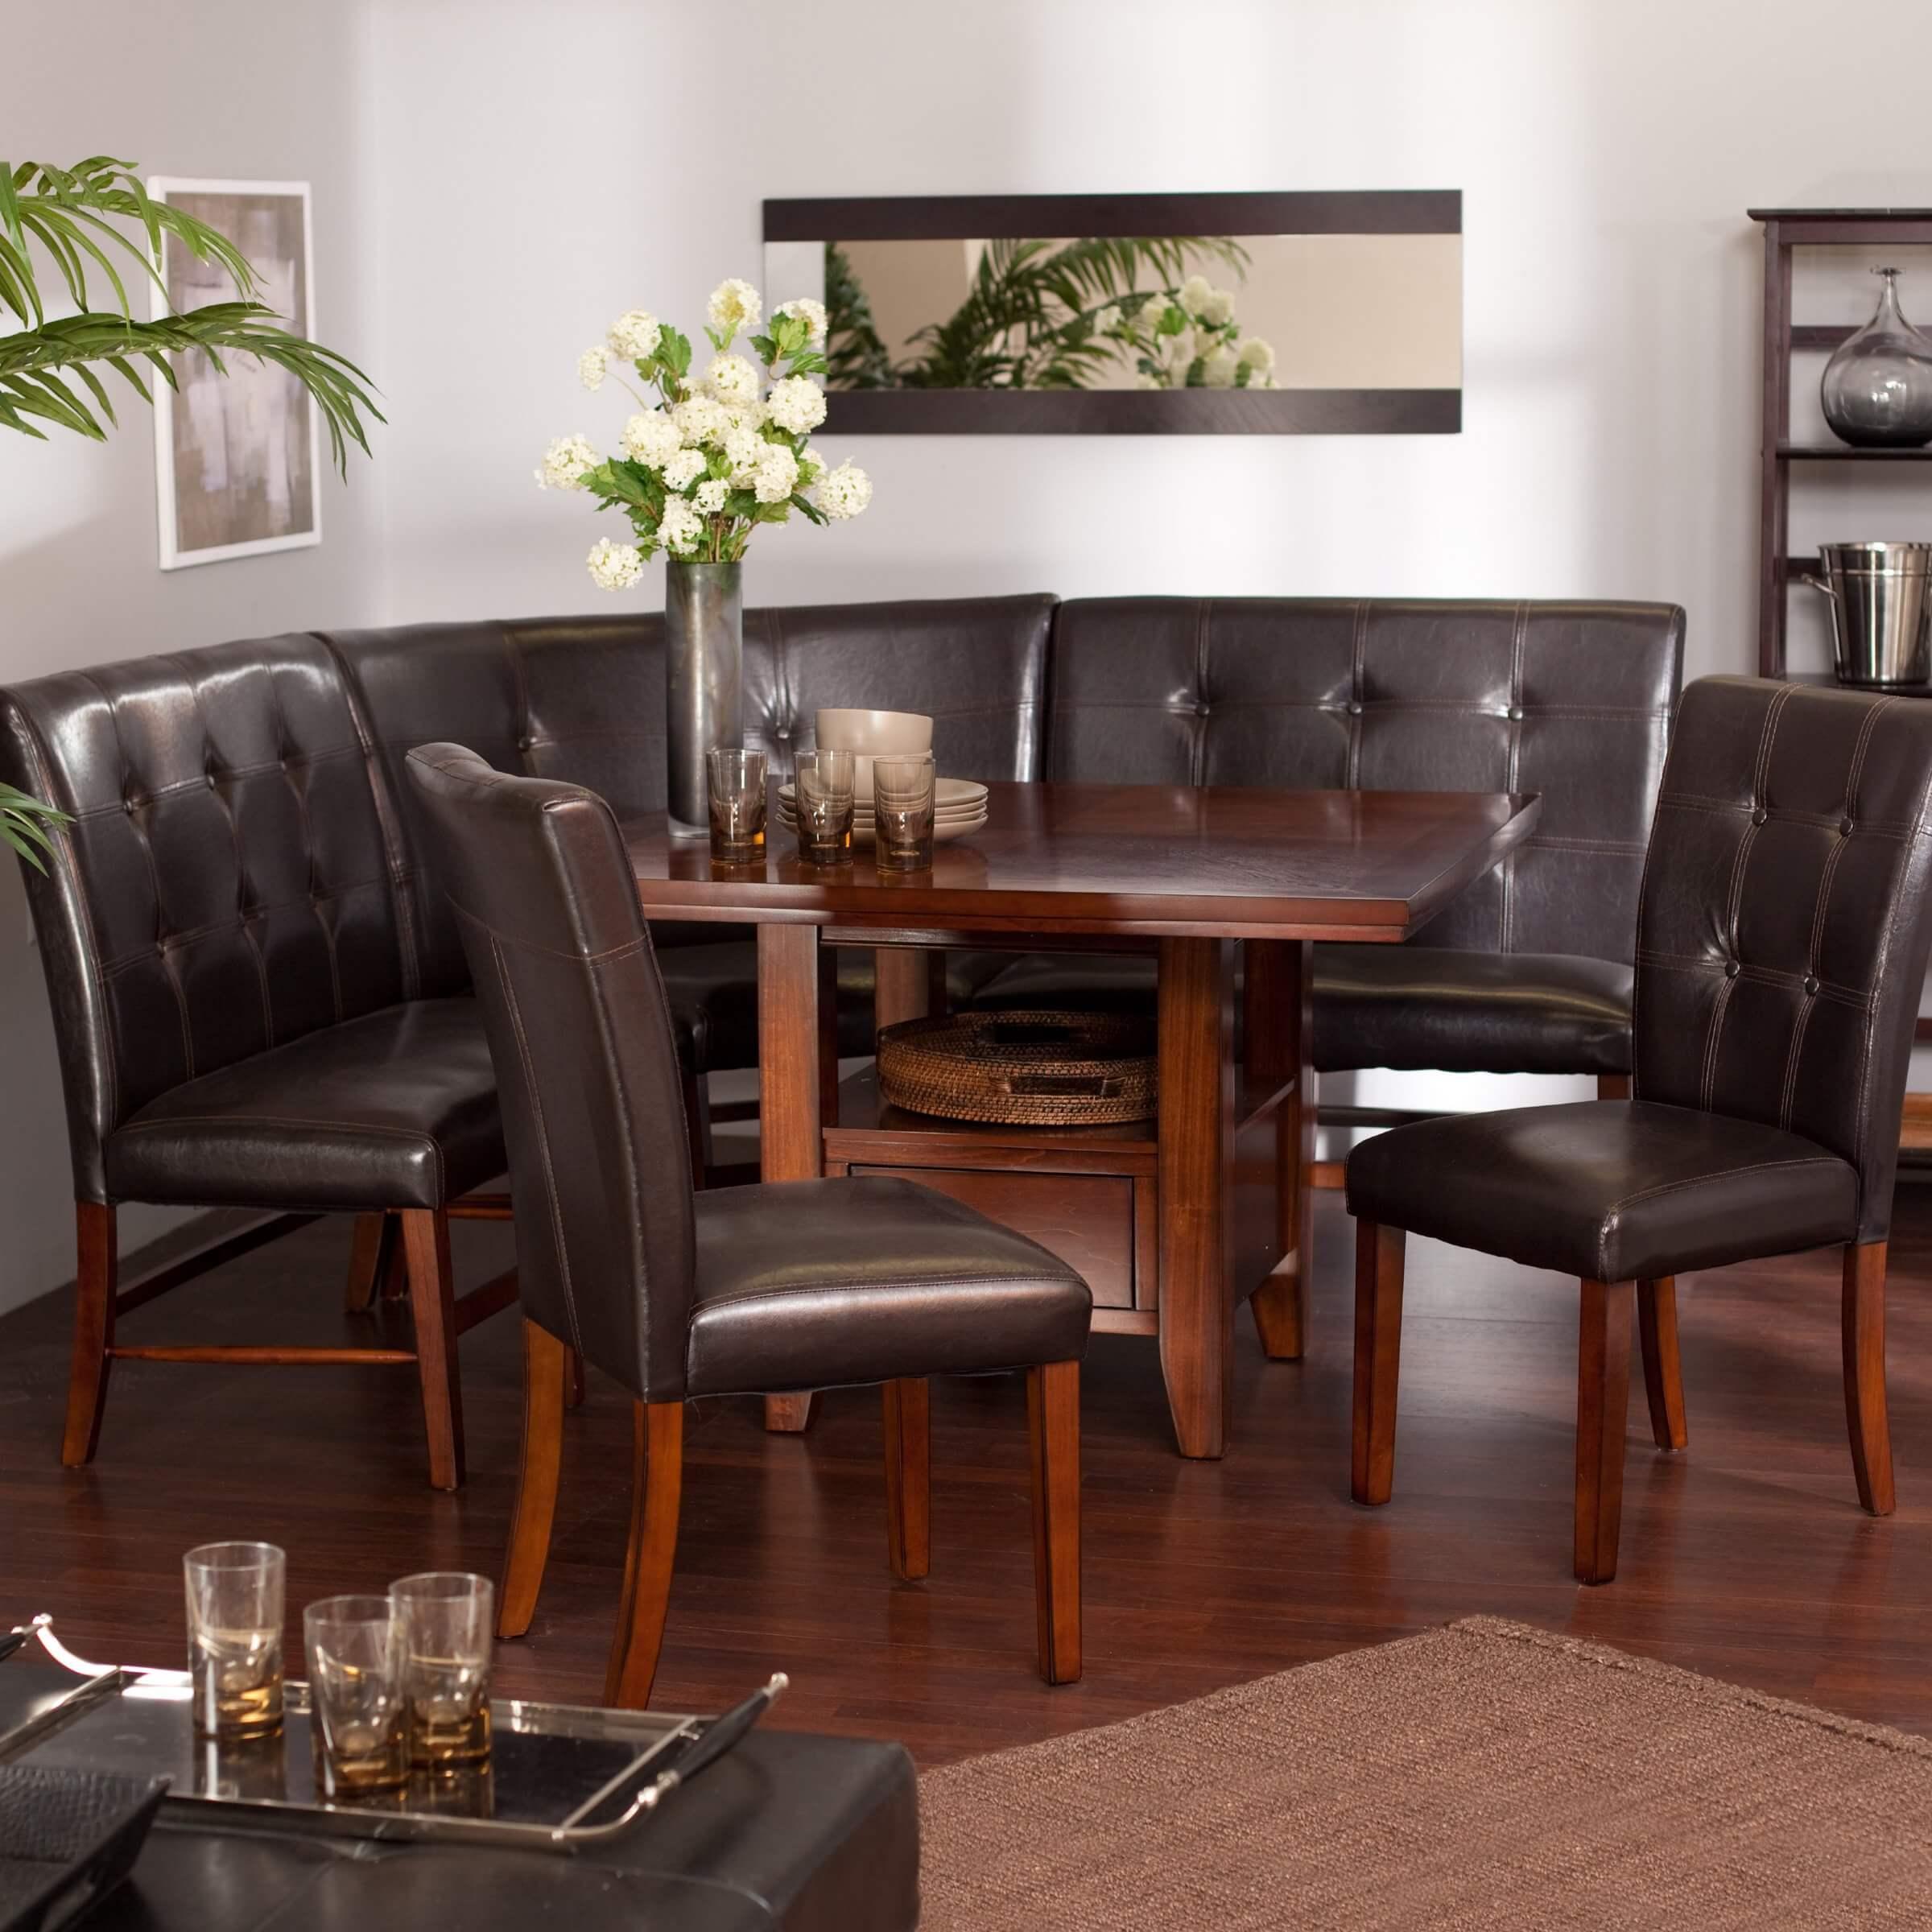 breakfast nook furniture sets kitchen table sets Stunning Ravella Corner Six Piece Dining Nook Set